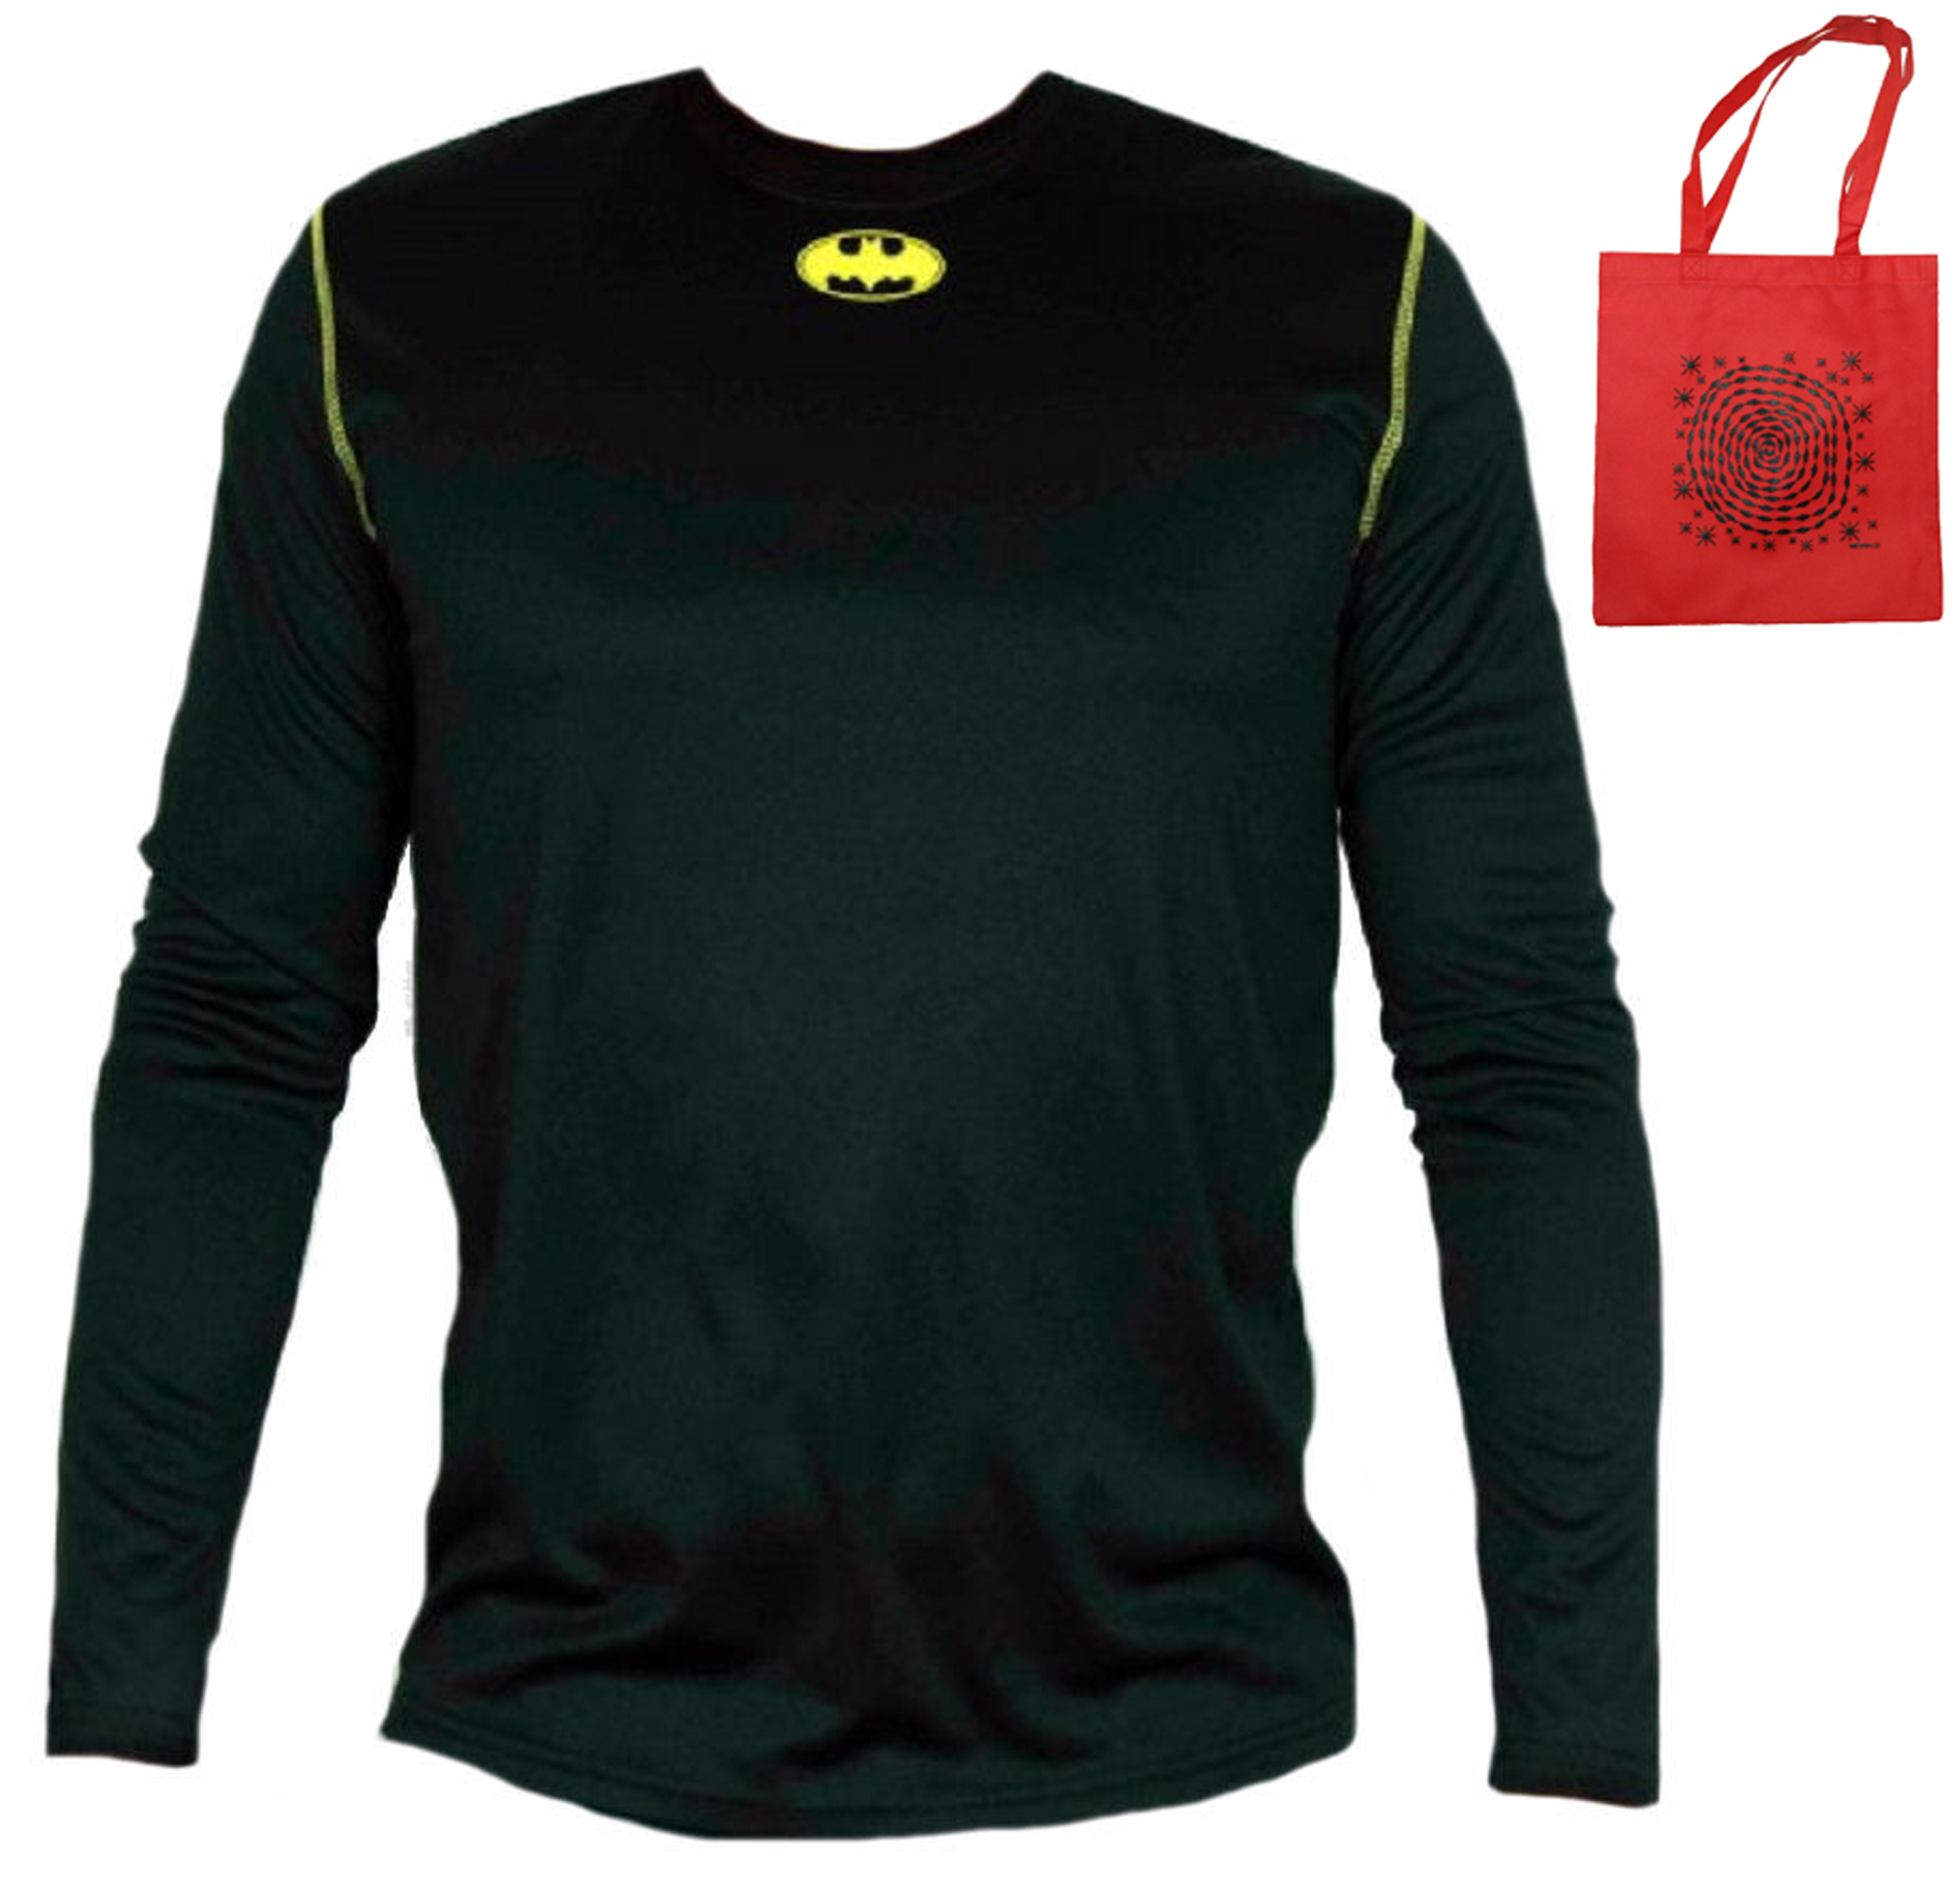 Batman Logo Mens' Climate Control Poly Shirt & Tote-2 Piece Gift Set by Bioworld